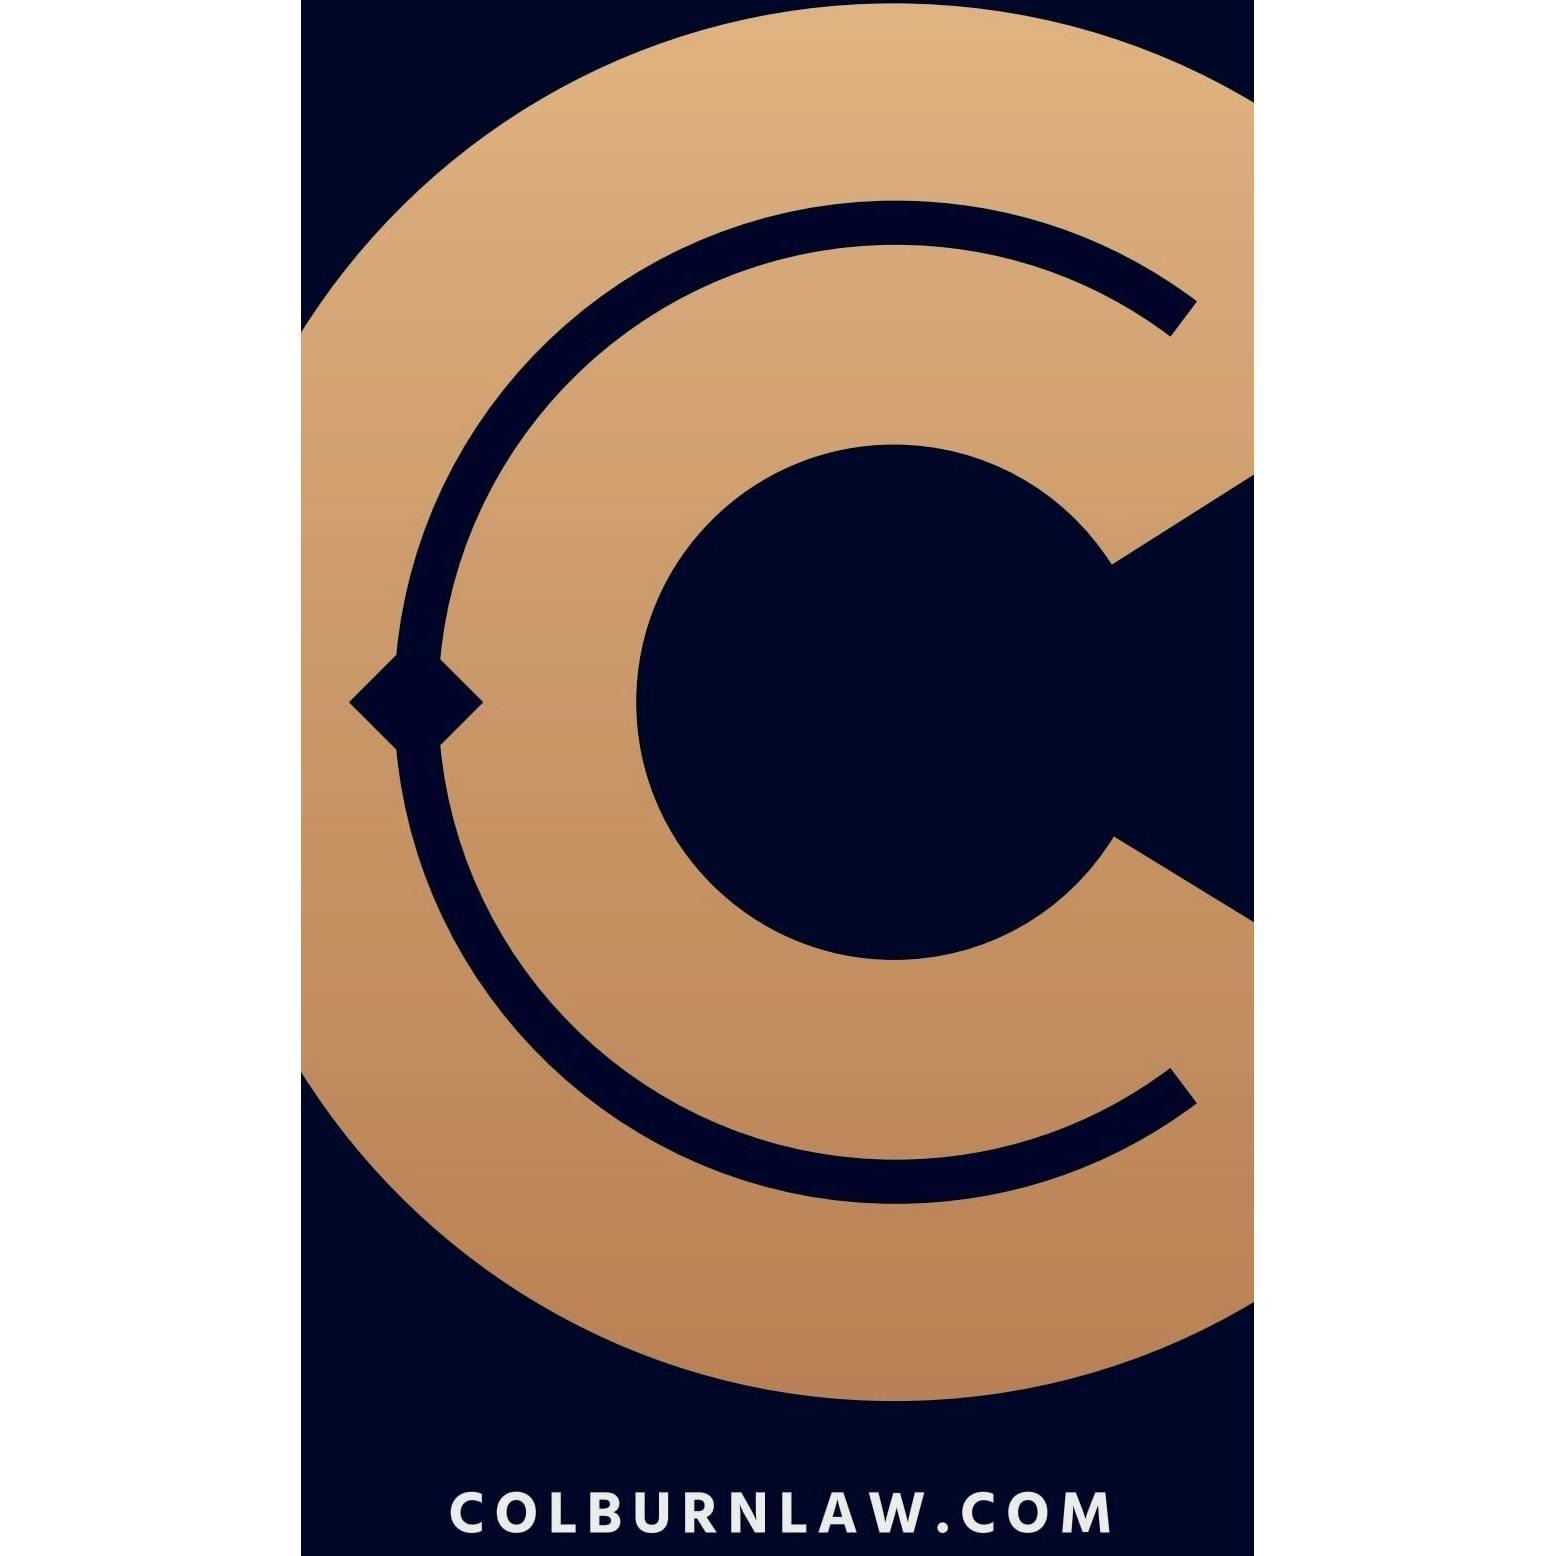 Colburn Law